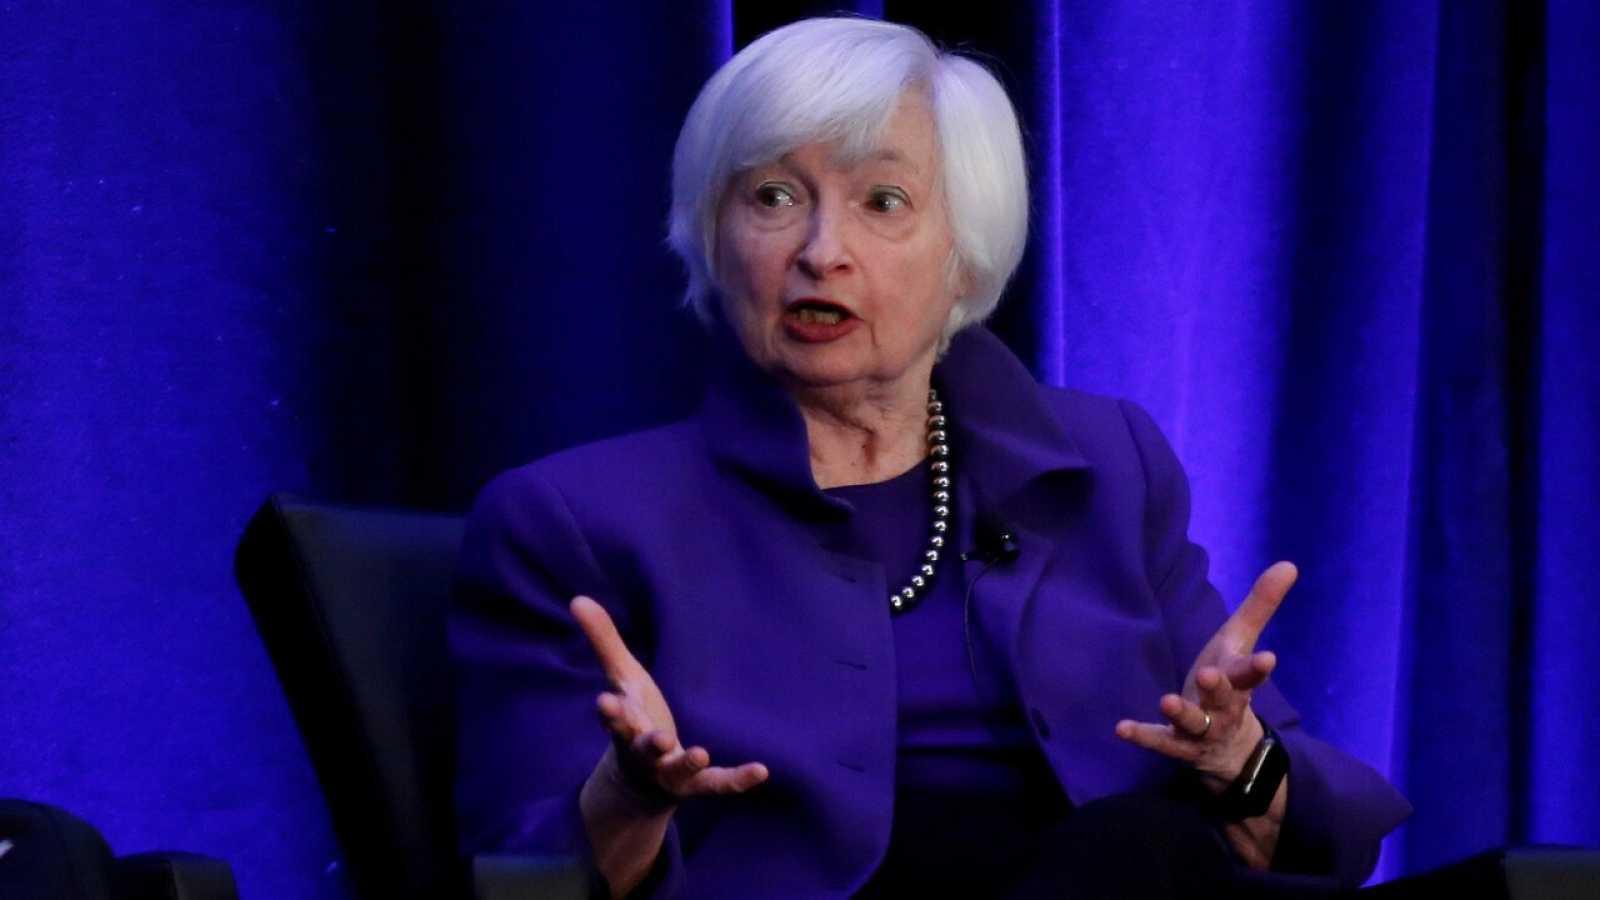 La expresidenta de la Fed Janet Yellen en una foto de archivo (2019). REUTERS/Christopher Aluka Berry